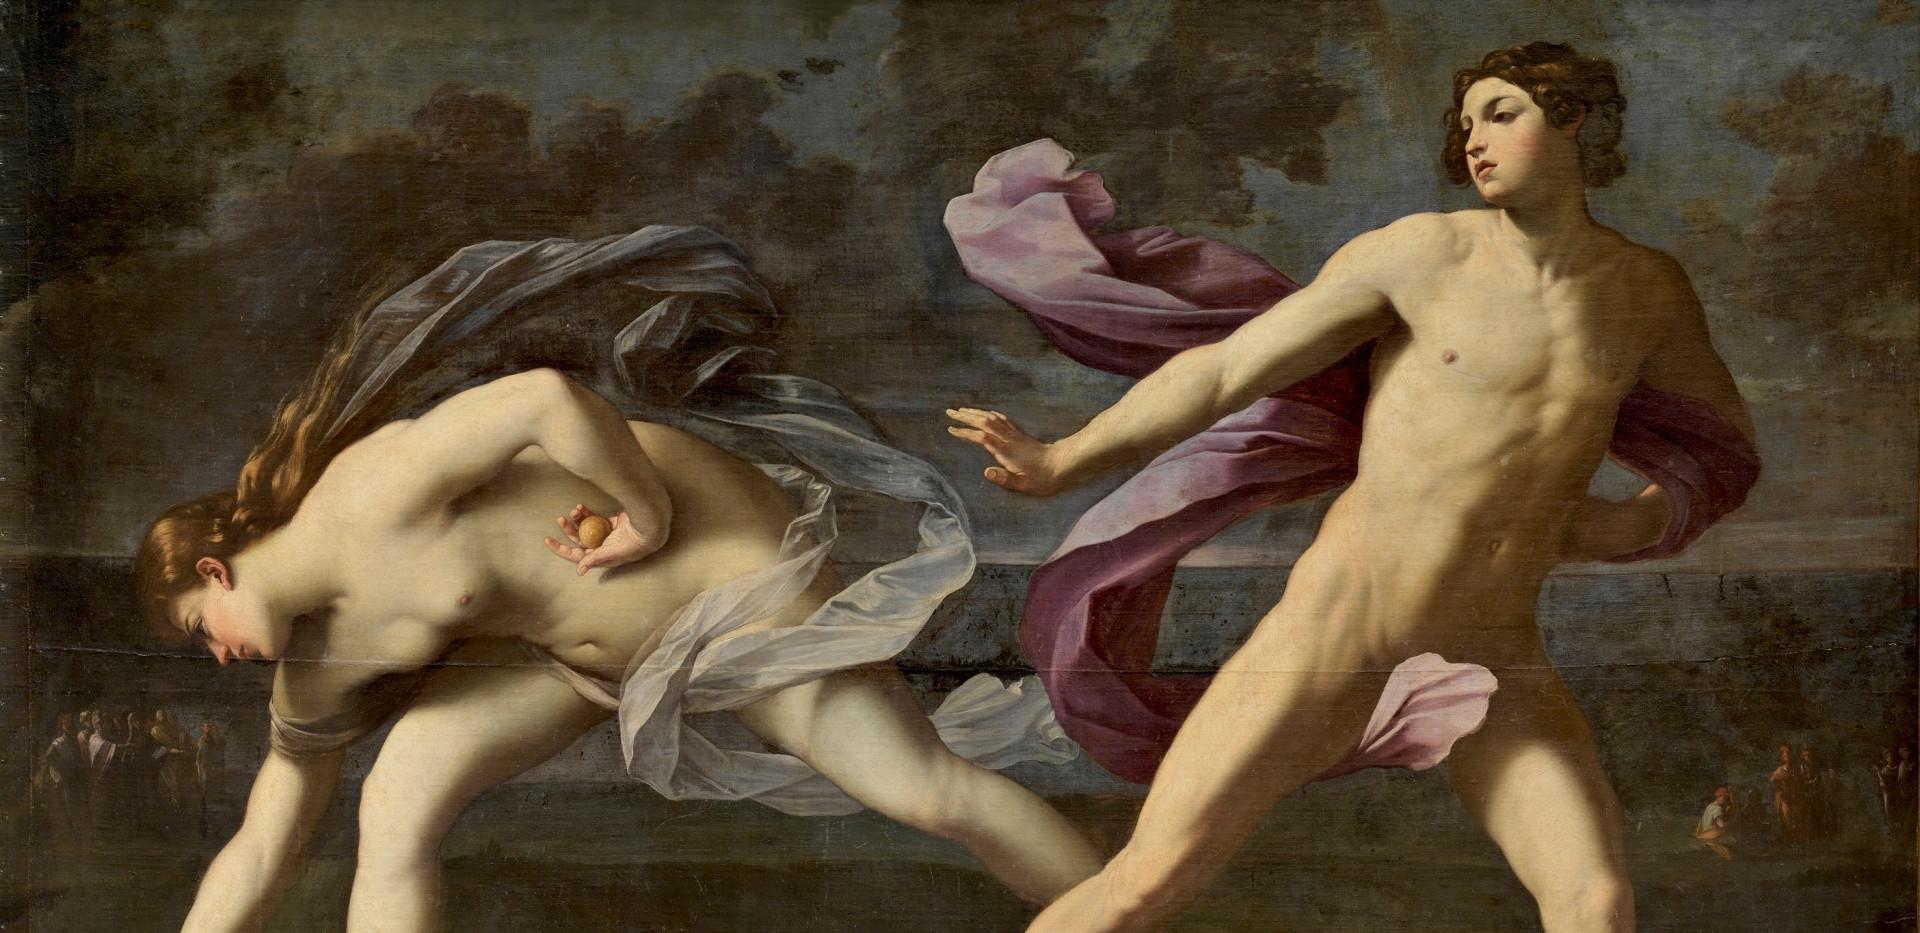 Atalanta e Hipomenes de Guido Reni, Museo del Prado